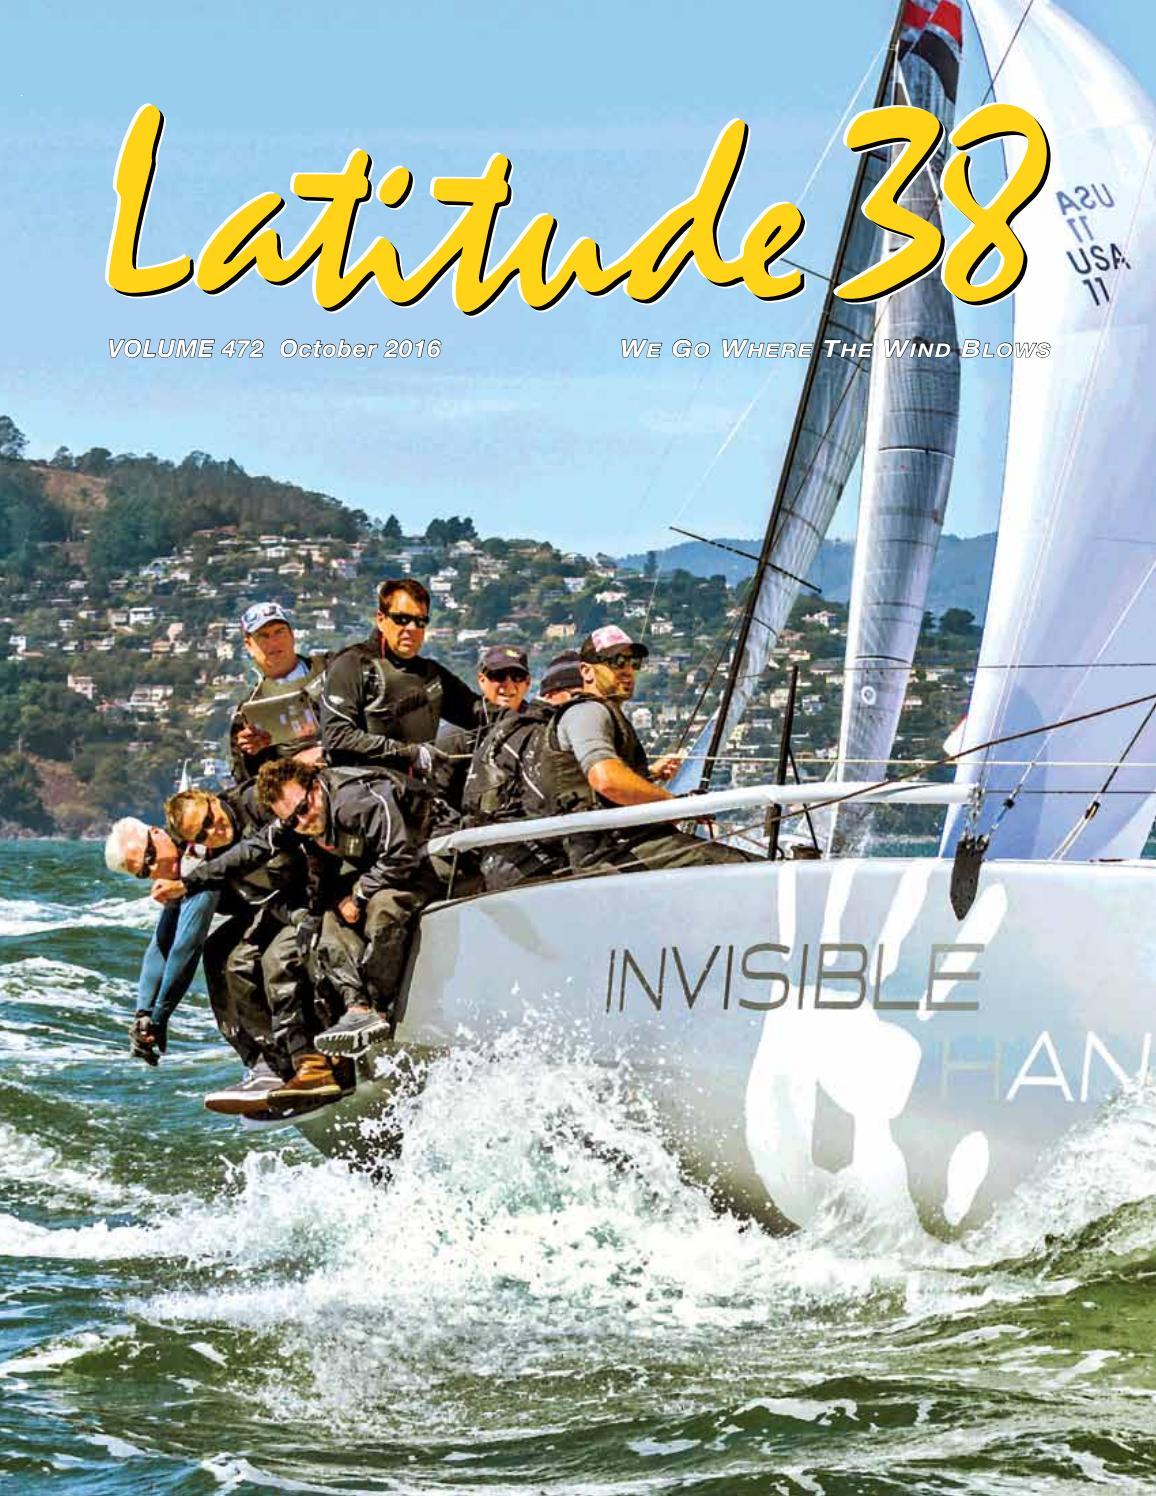 Latitude 38 oct 2016 by latitude 38 media llc issuu fandeluxe Images